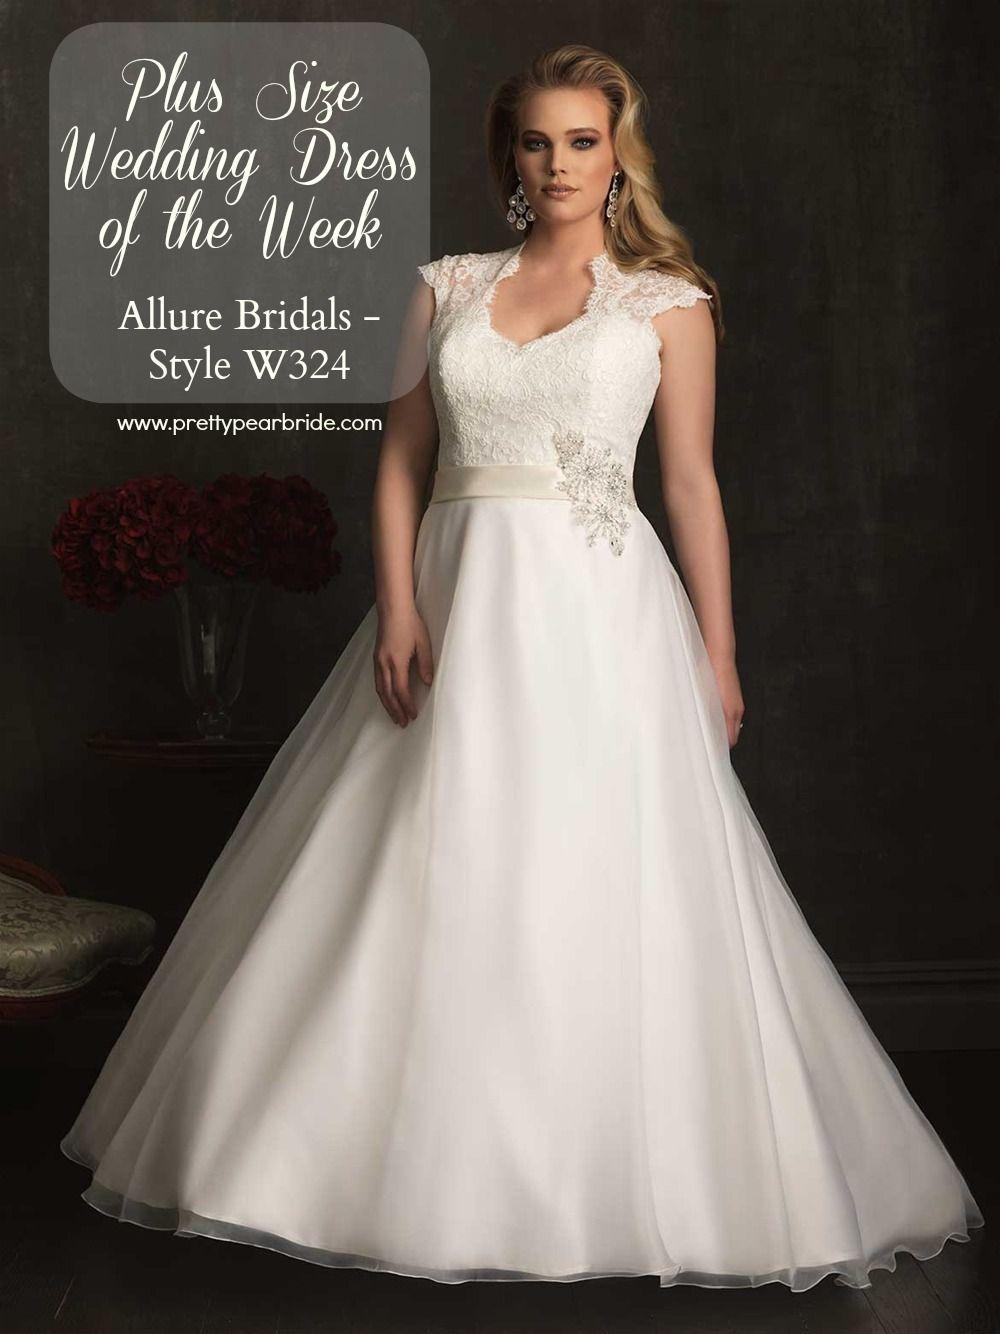 Plus Size Wedding Dress Of The Week Allure Bridal Style W324 Pretty Pear Bride Magazine